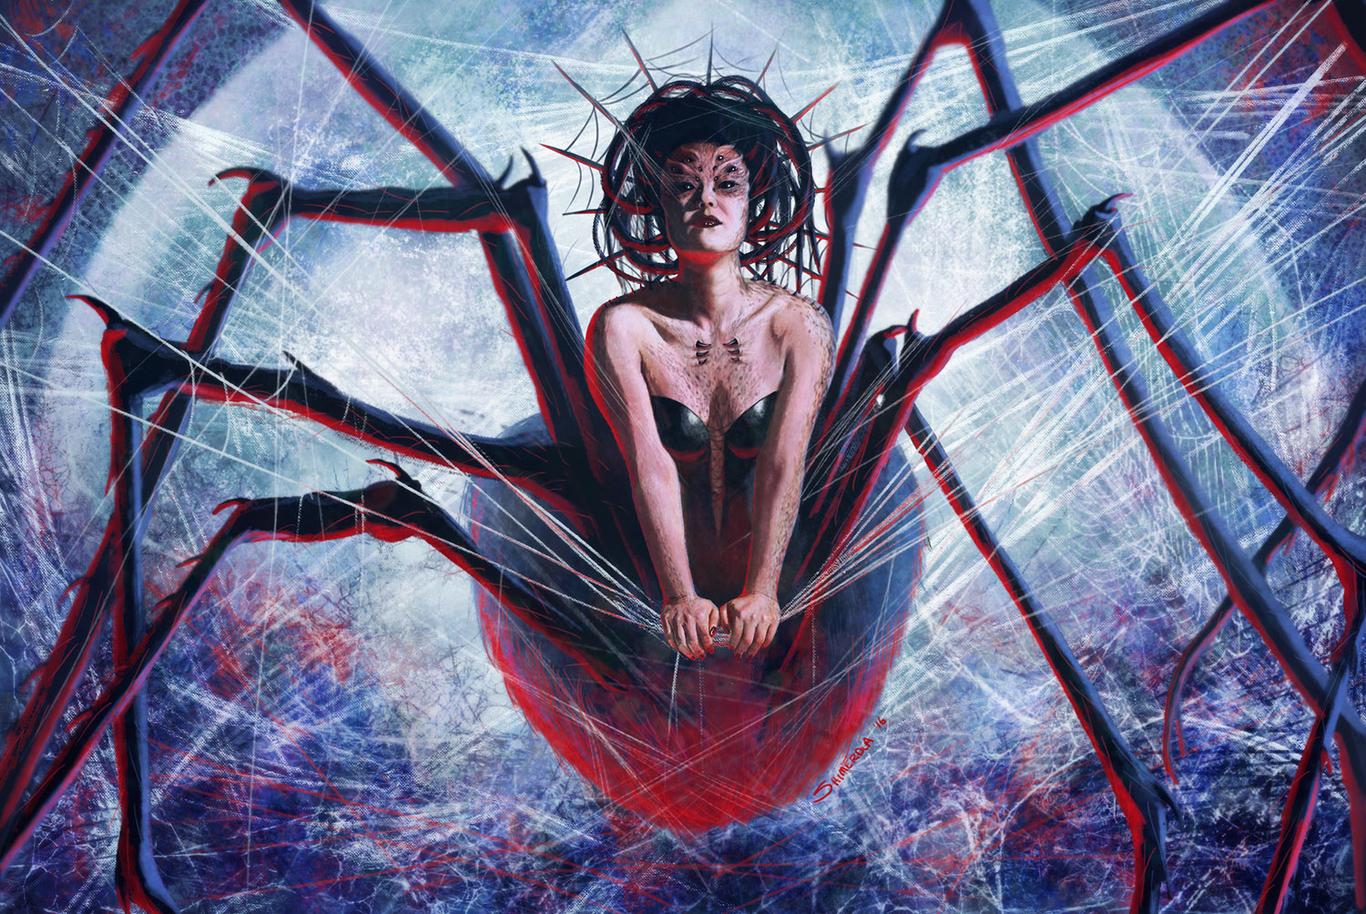 Rainne spider queen 1 c02d6186 imfu